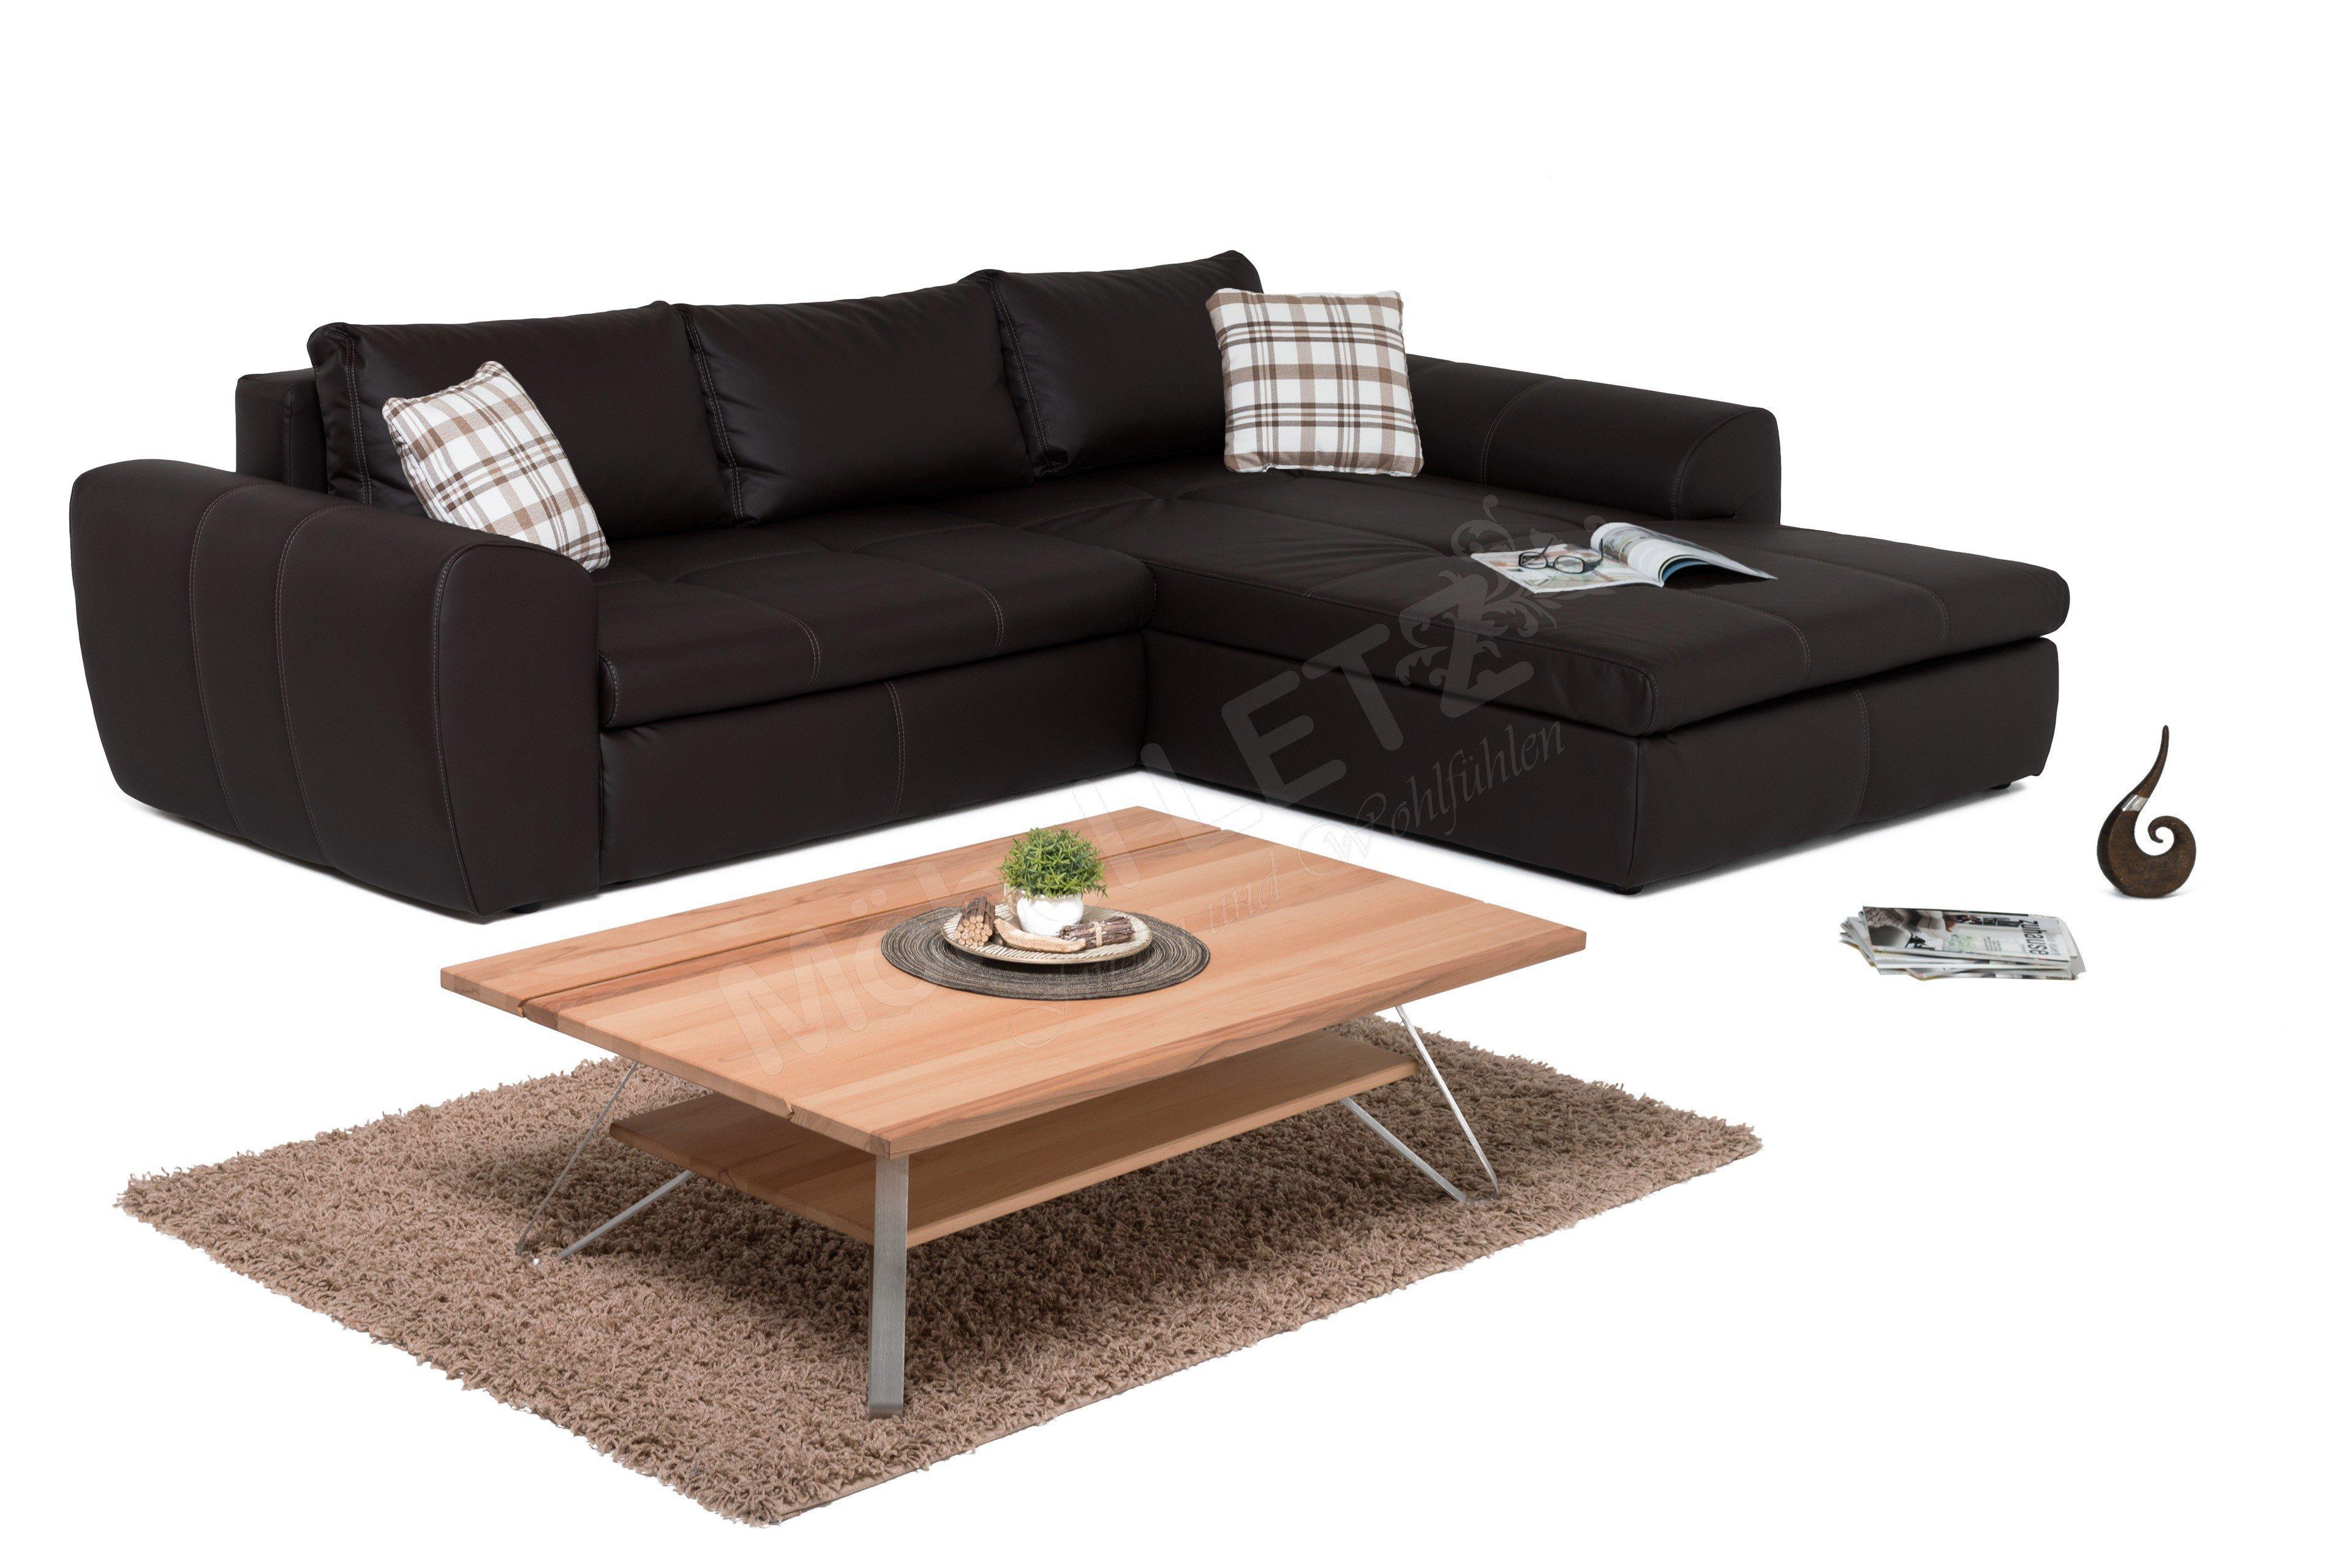 jockenh fer cascadeur polstergarnitur in braun m bel letz ihr online shop. Black Bedroom Furniture Sets. Home Design Ideas